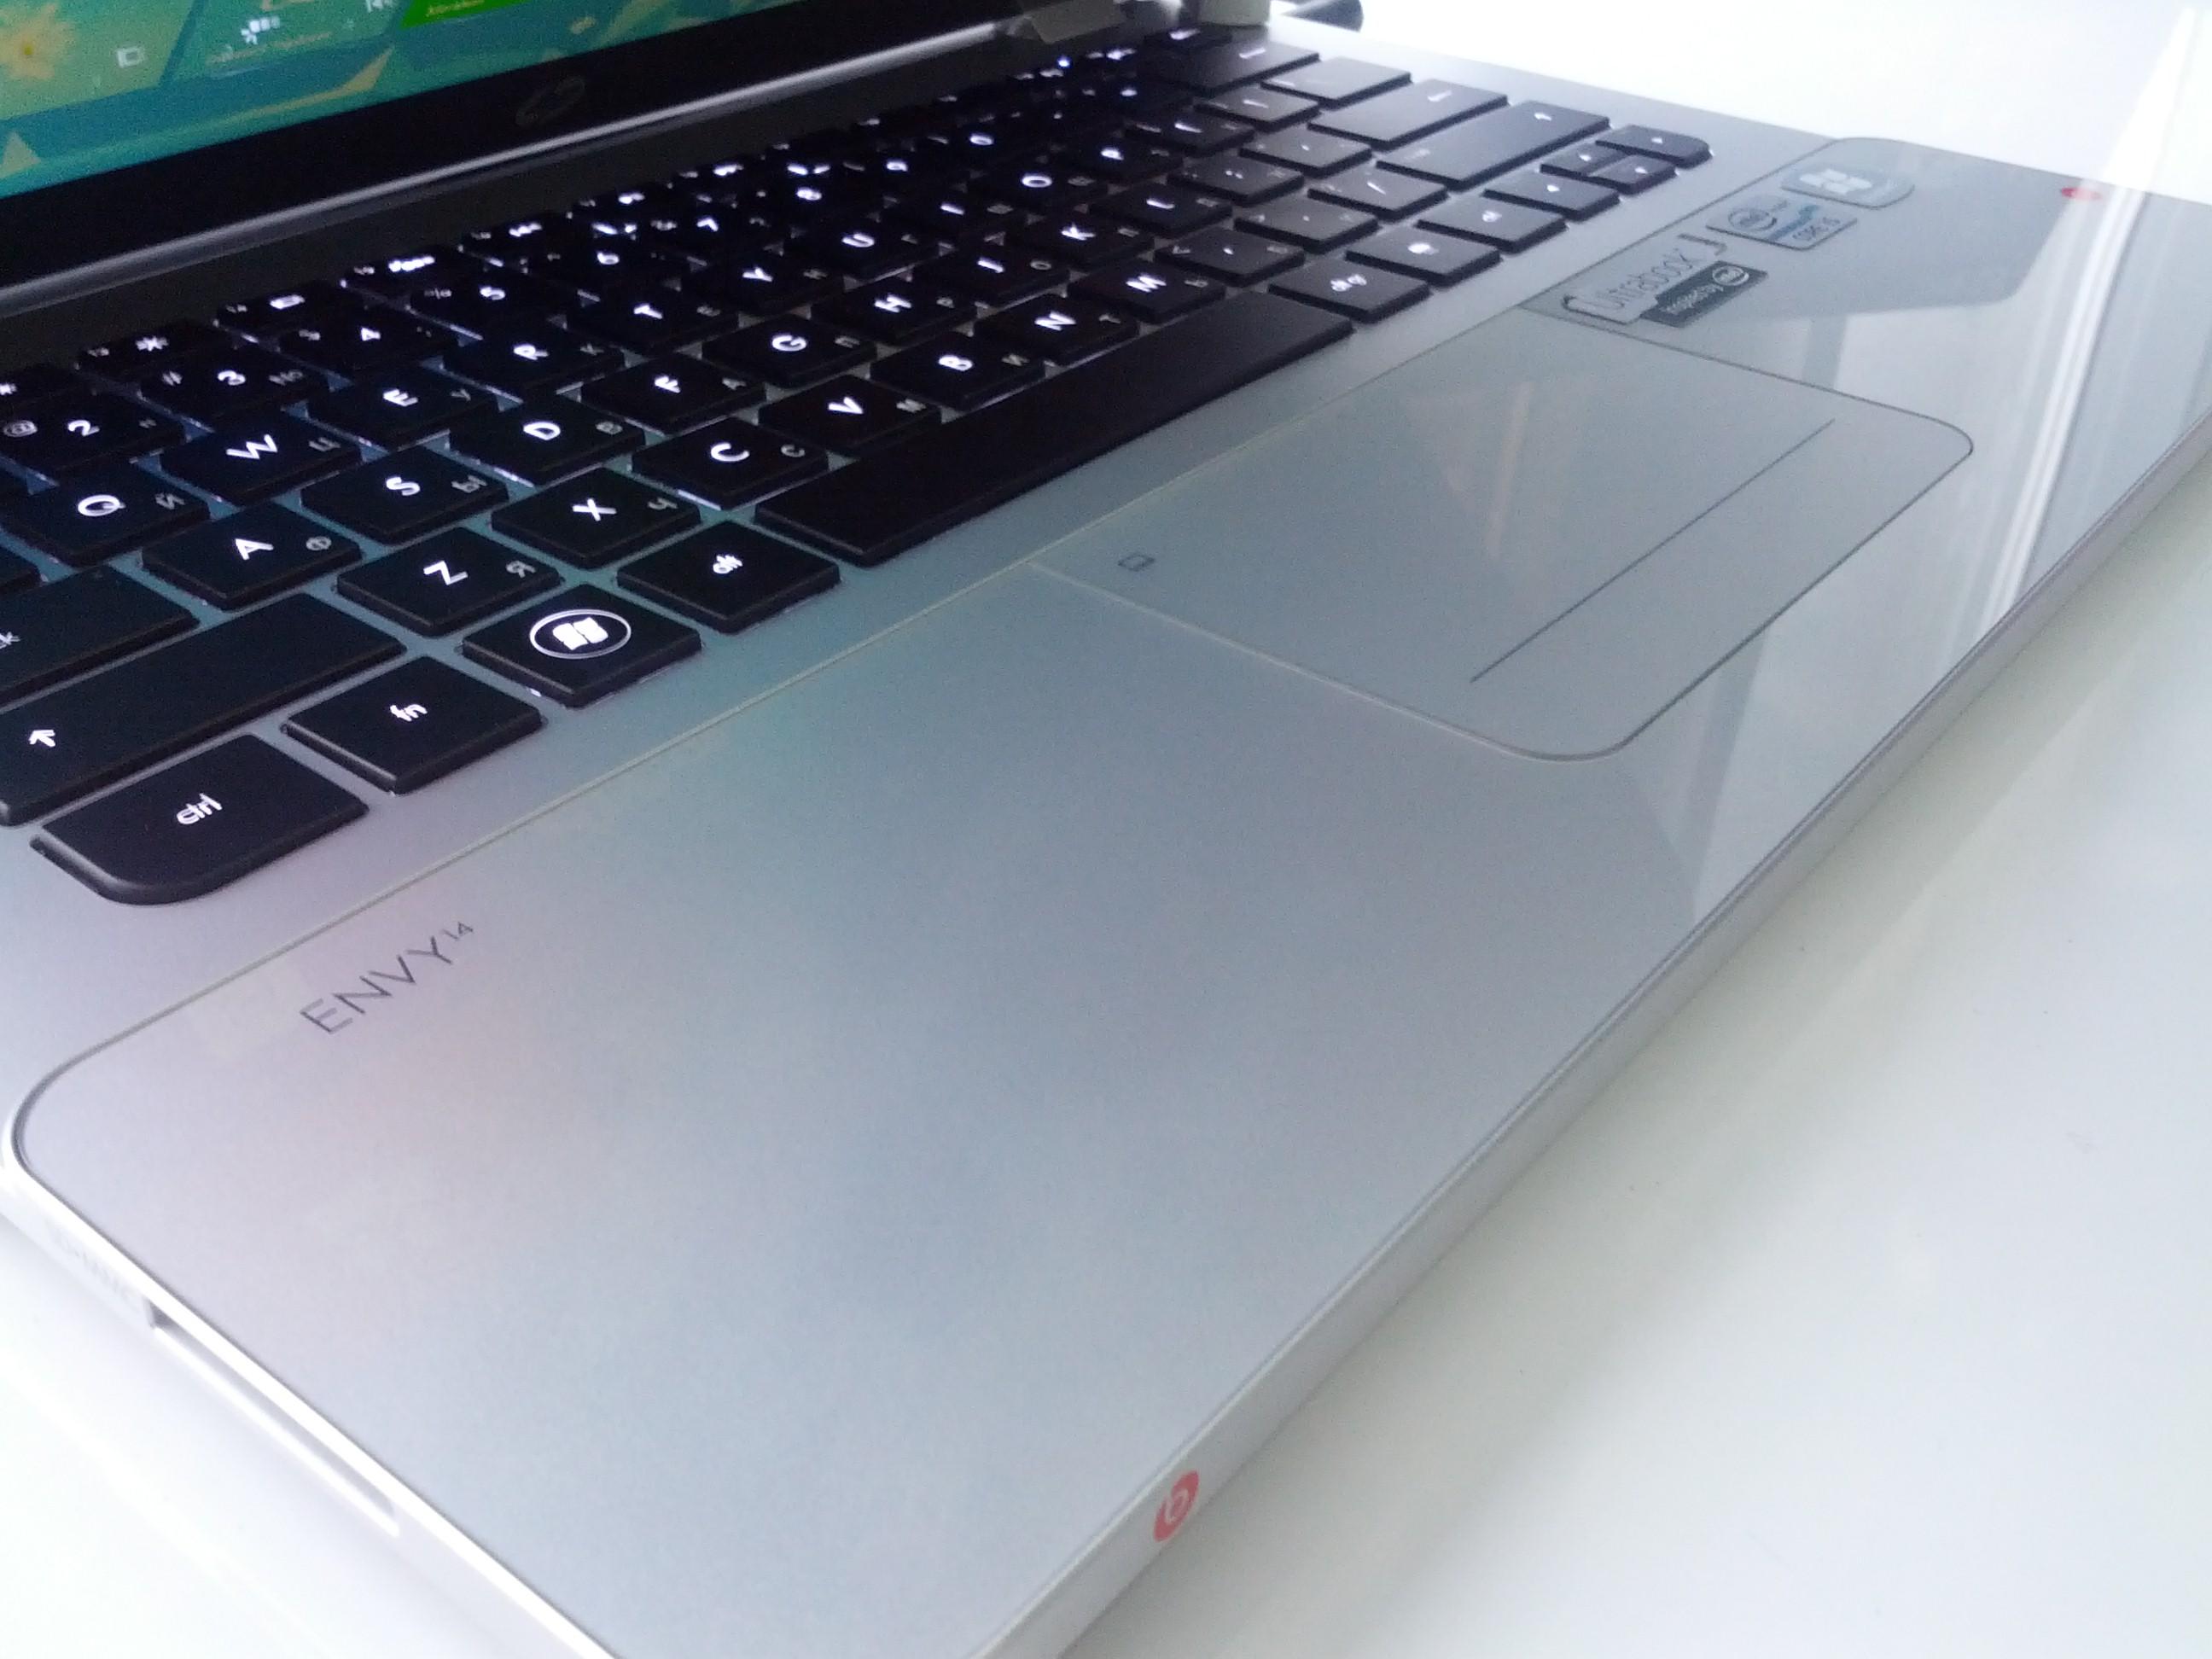 HP ENVY 14 Spectre - рабочая стеклянная поверхность с Gorilla Glass 2